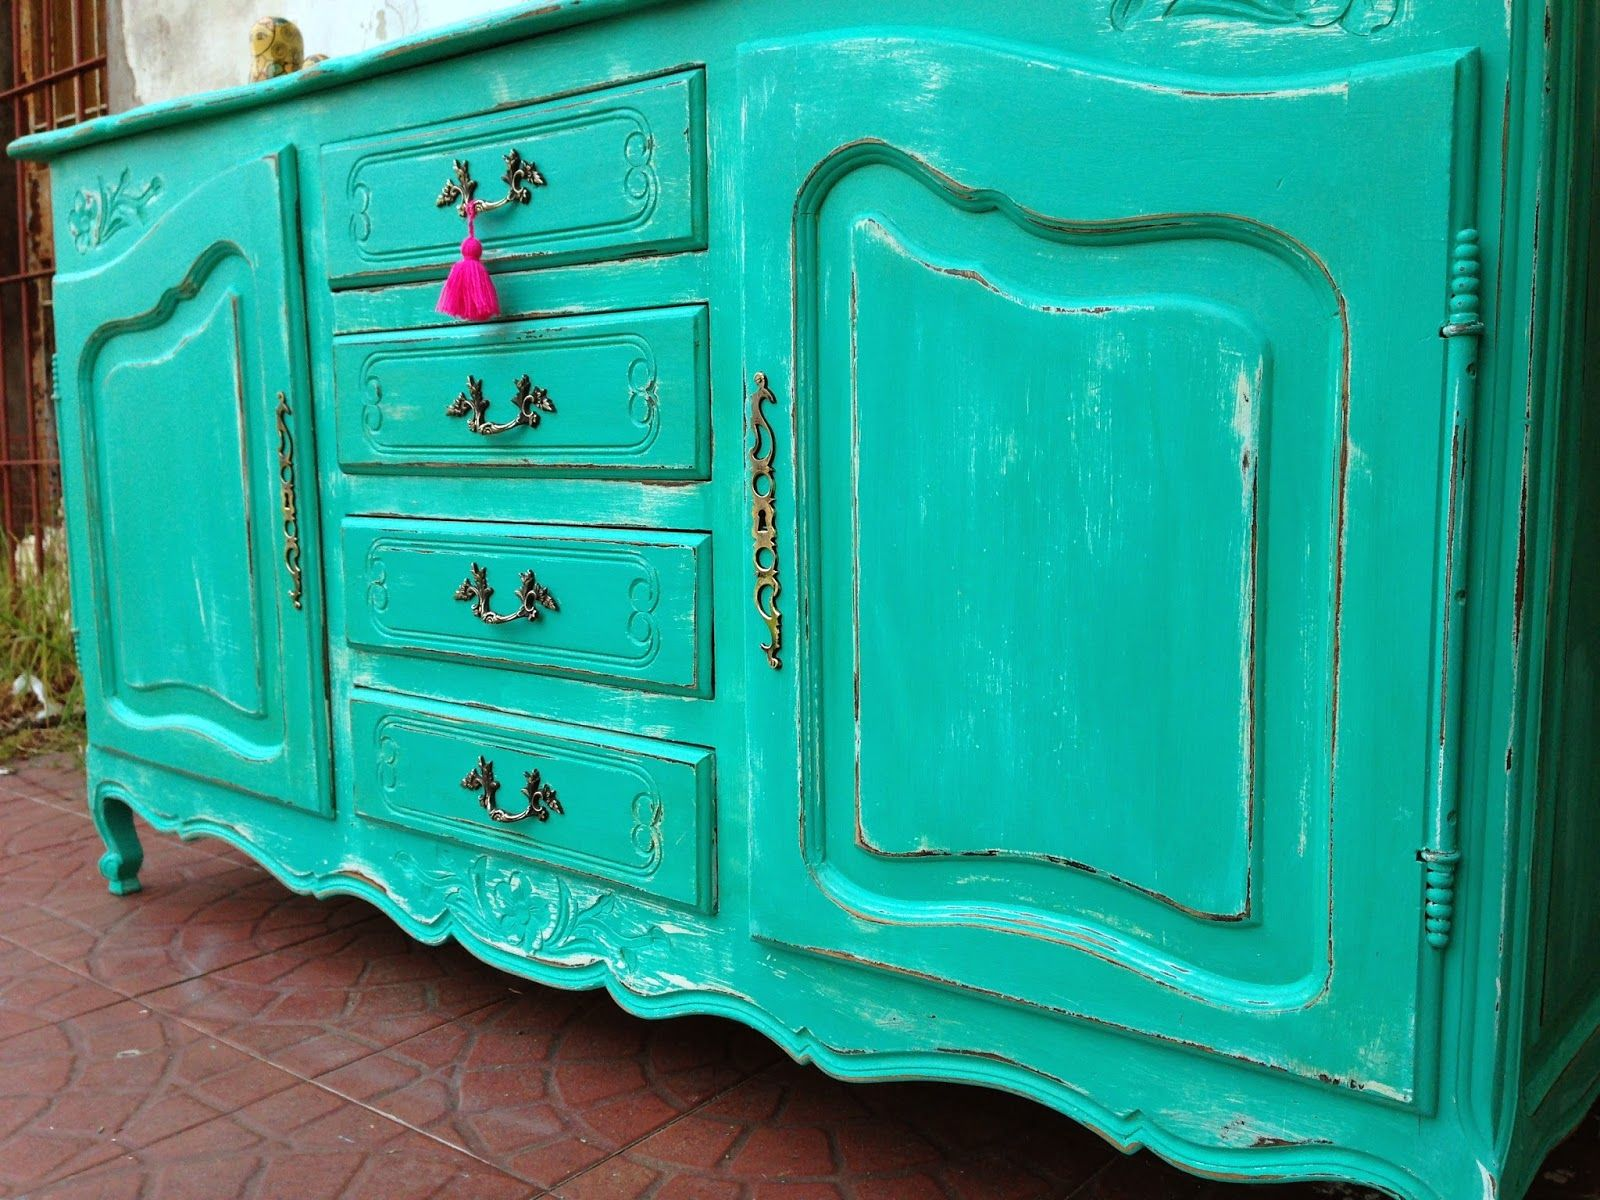 Mejores 29 Im Genes De Muebles En Pinterest Muebles Viejos  # Muebles Gastados